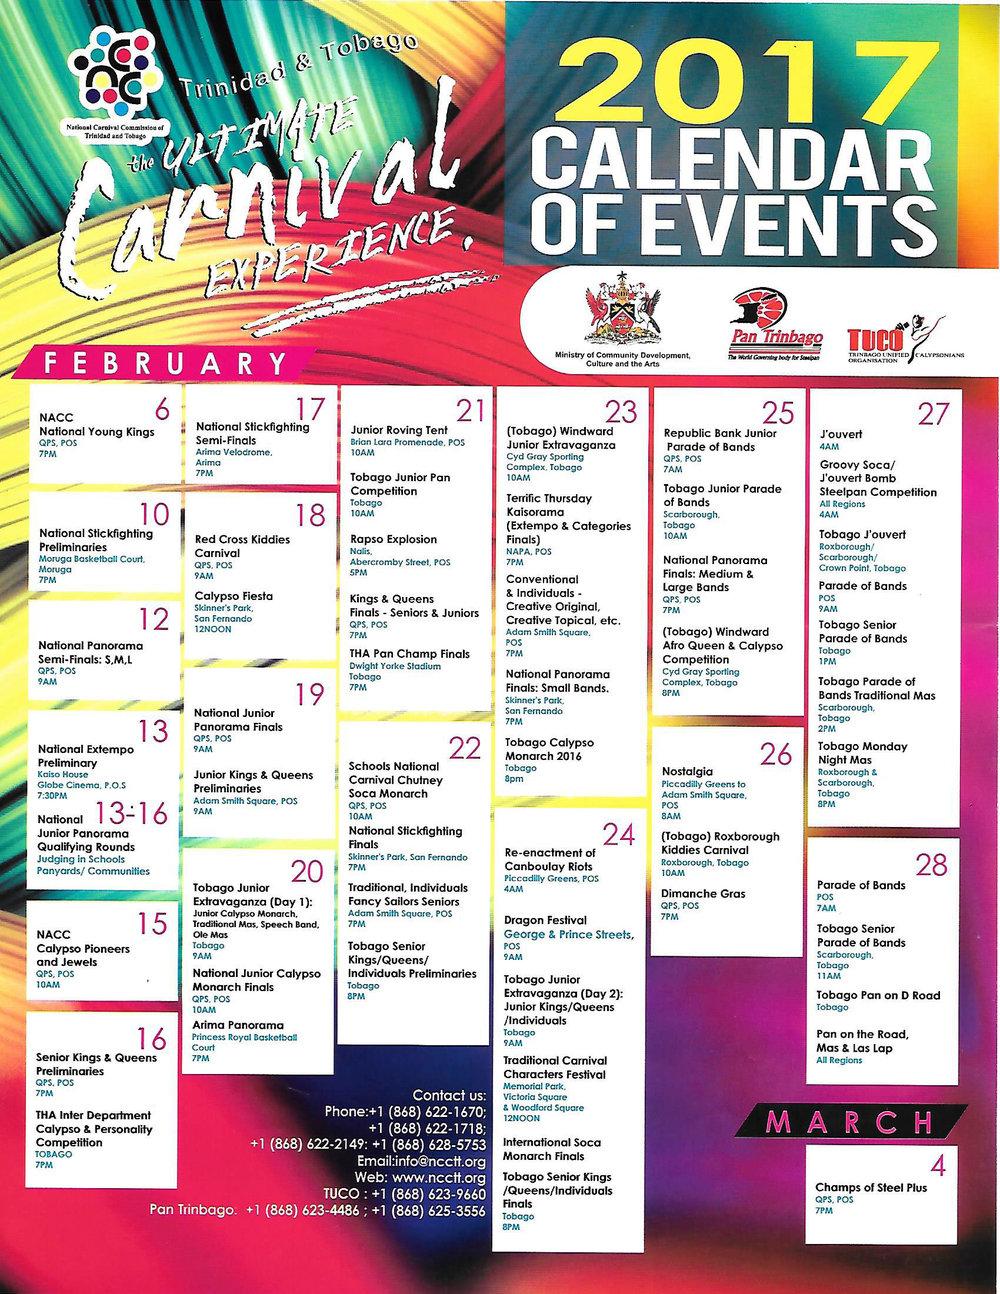 National Carnival Commission Calendar 2017 Caribbean Affairs Inc